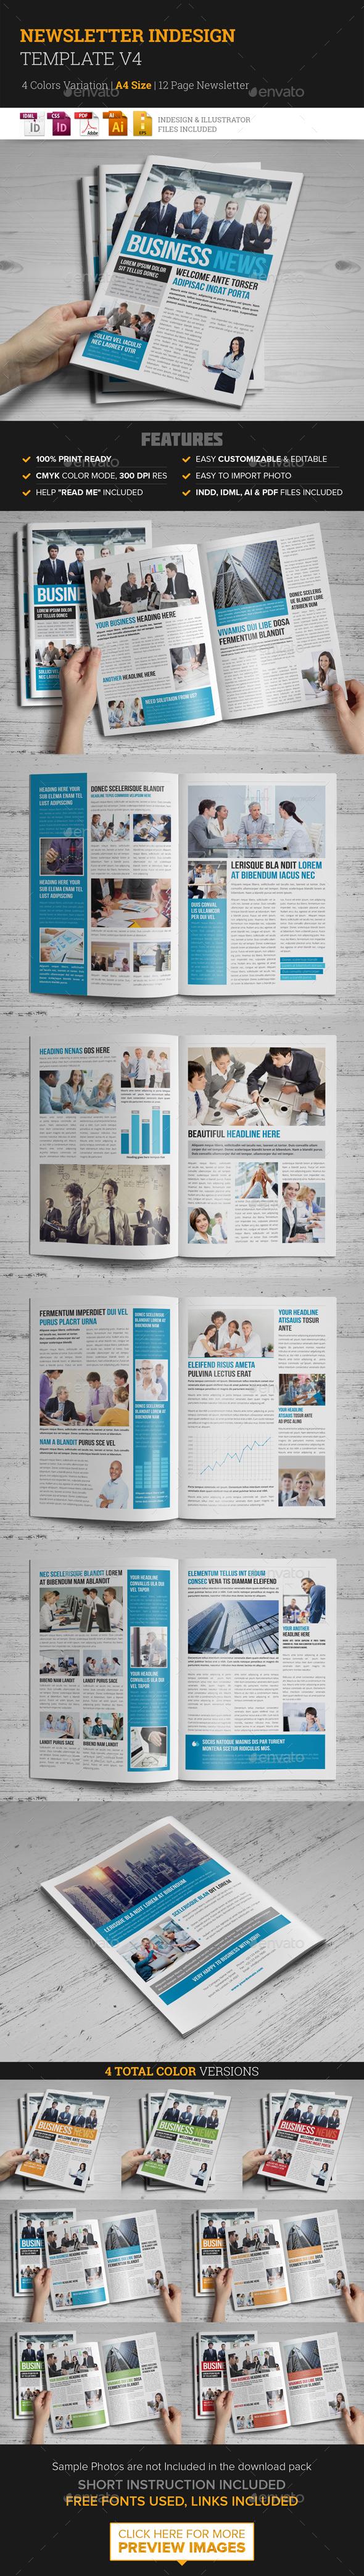 Newsletter Indesign Template v4 - Newsletters Print Templates